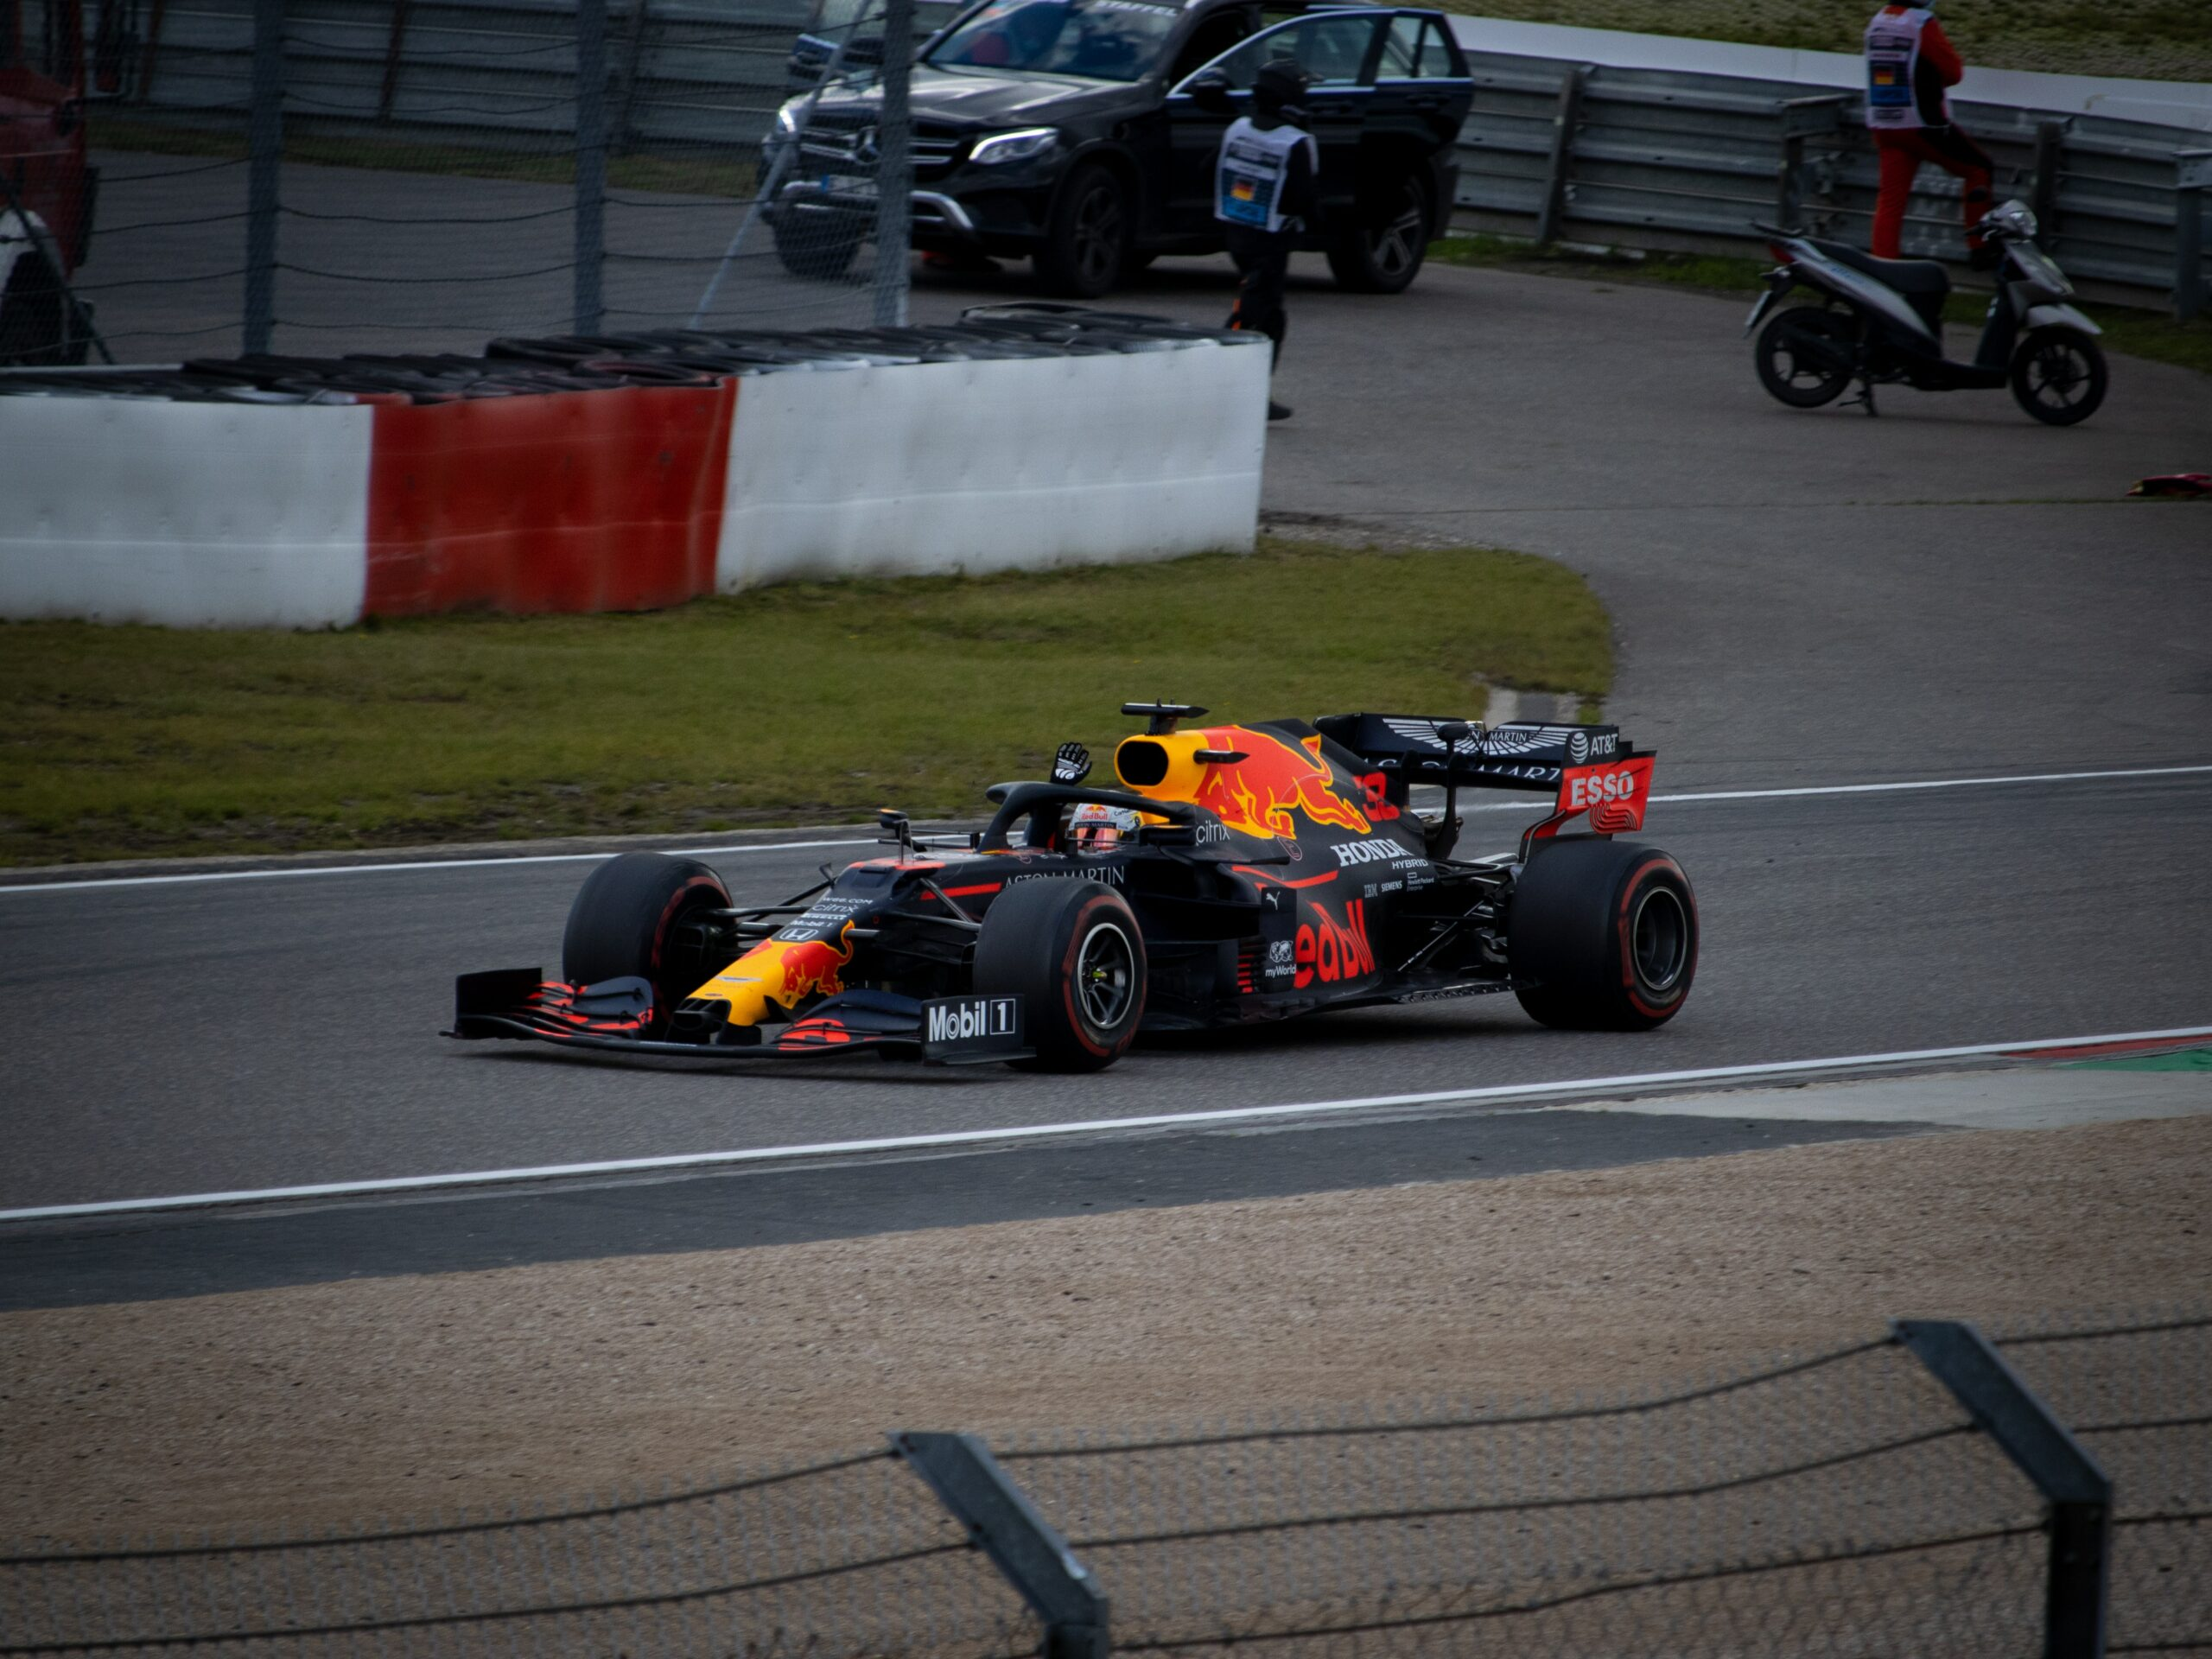 Campingplek – GP Oostenrijk – Formule 1 Red Bull Ring 2021